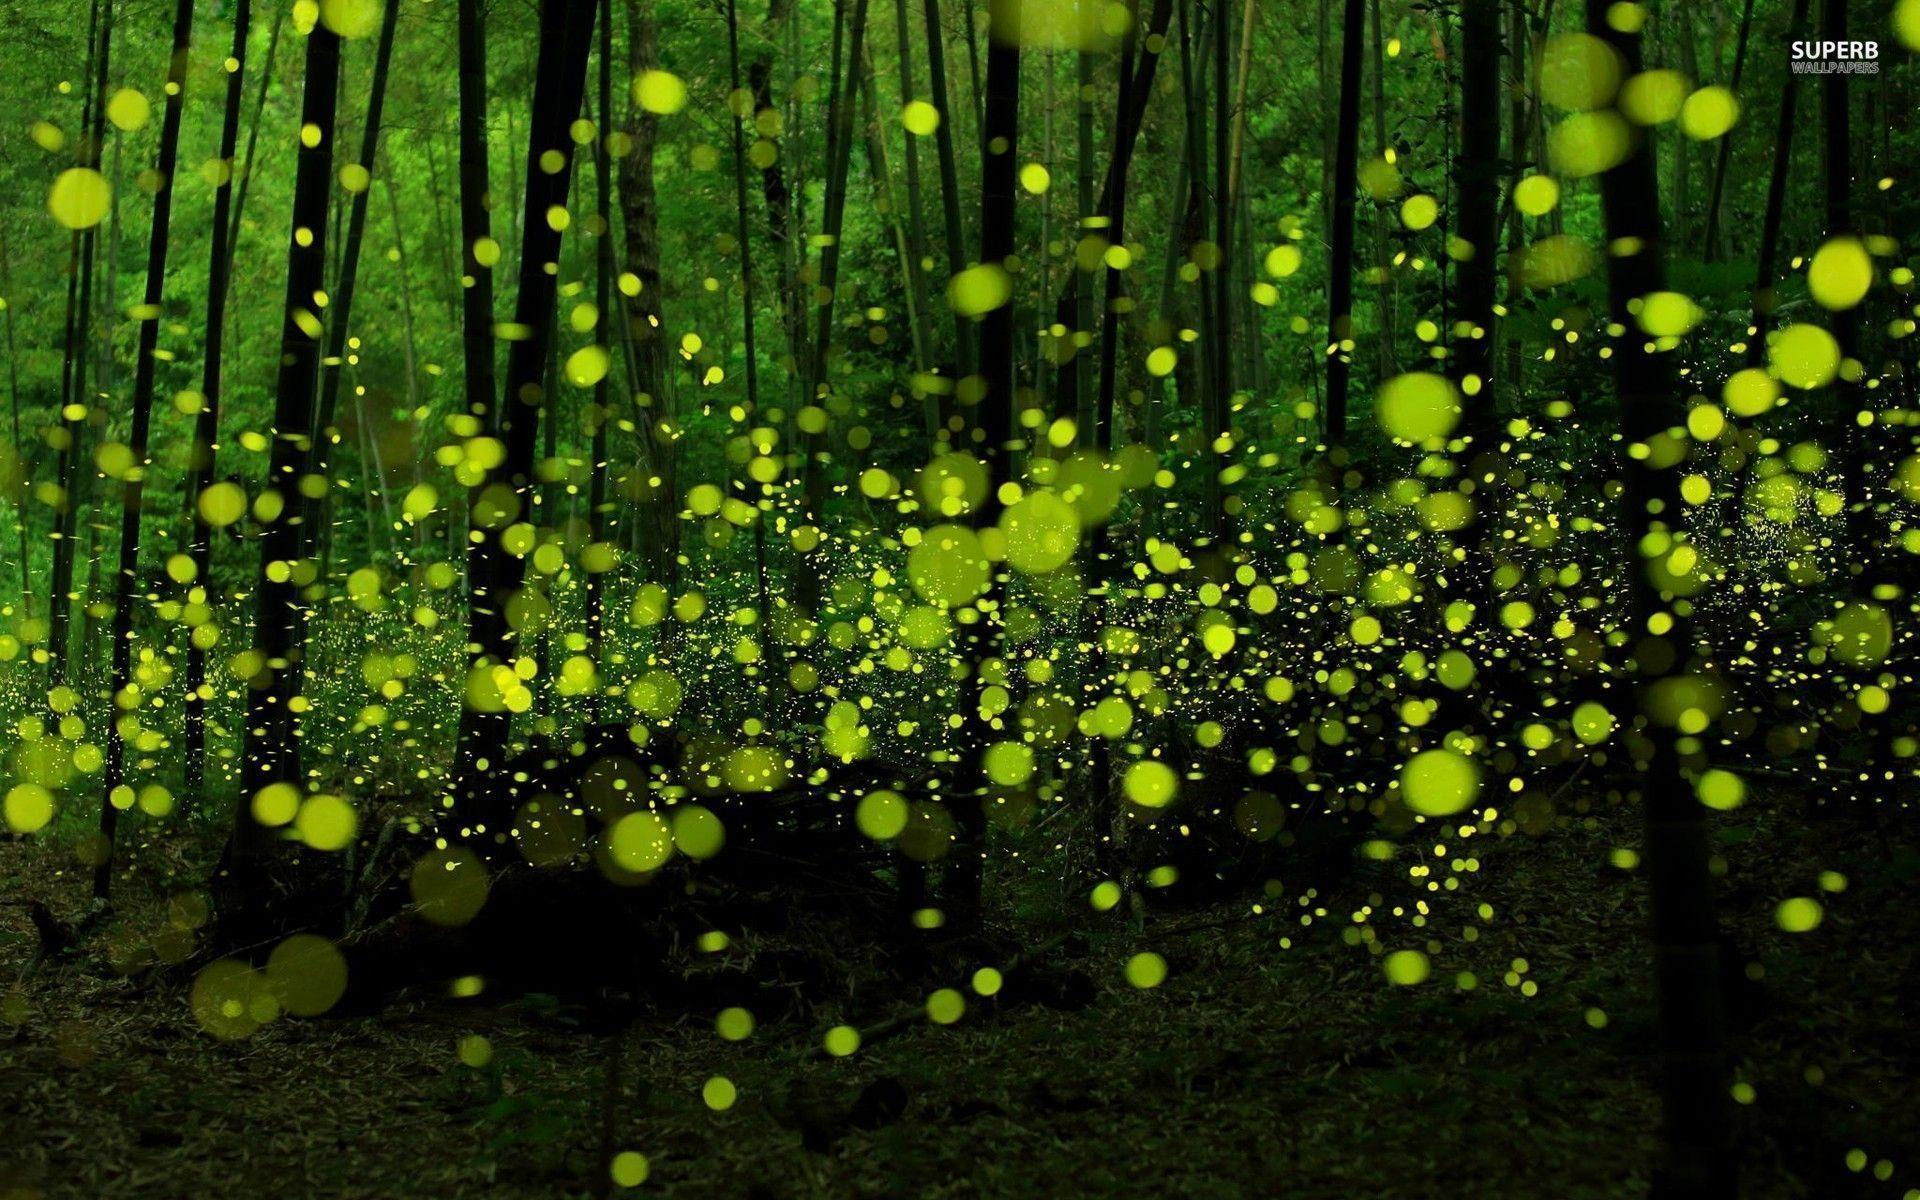 Fireflies Wallpapers - Full HD wallpaper search